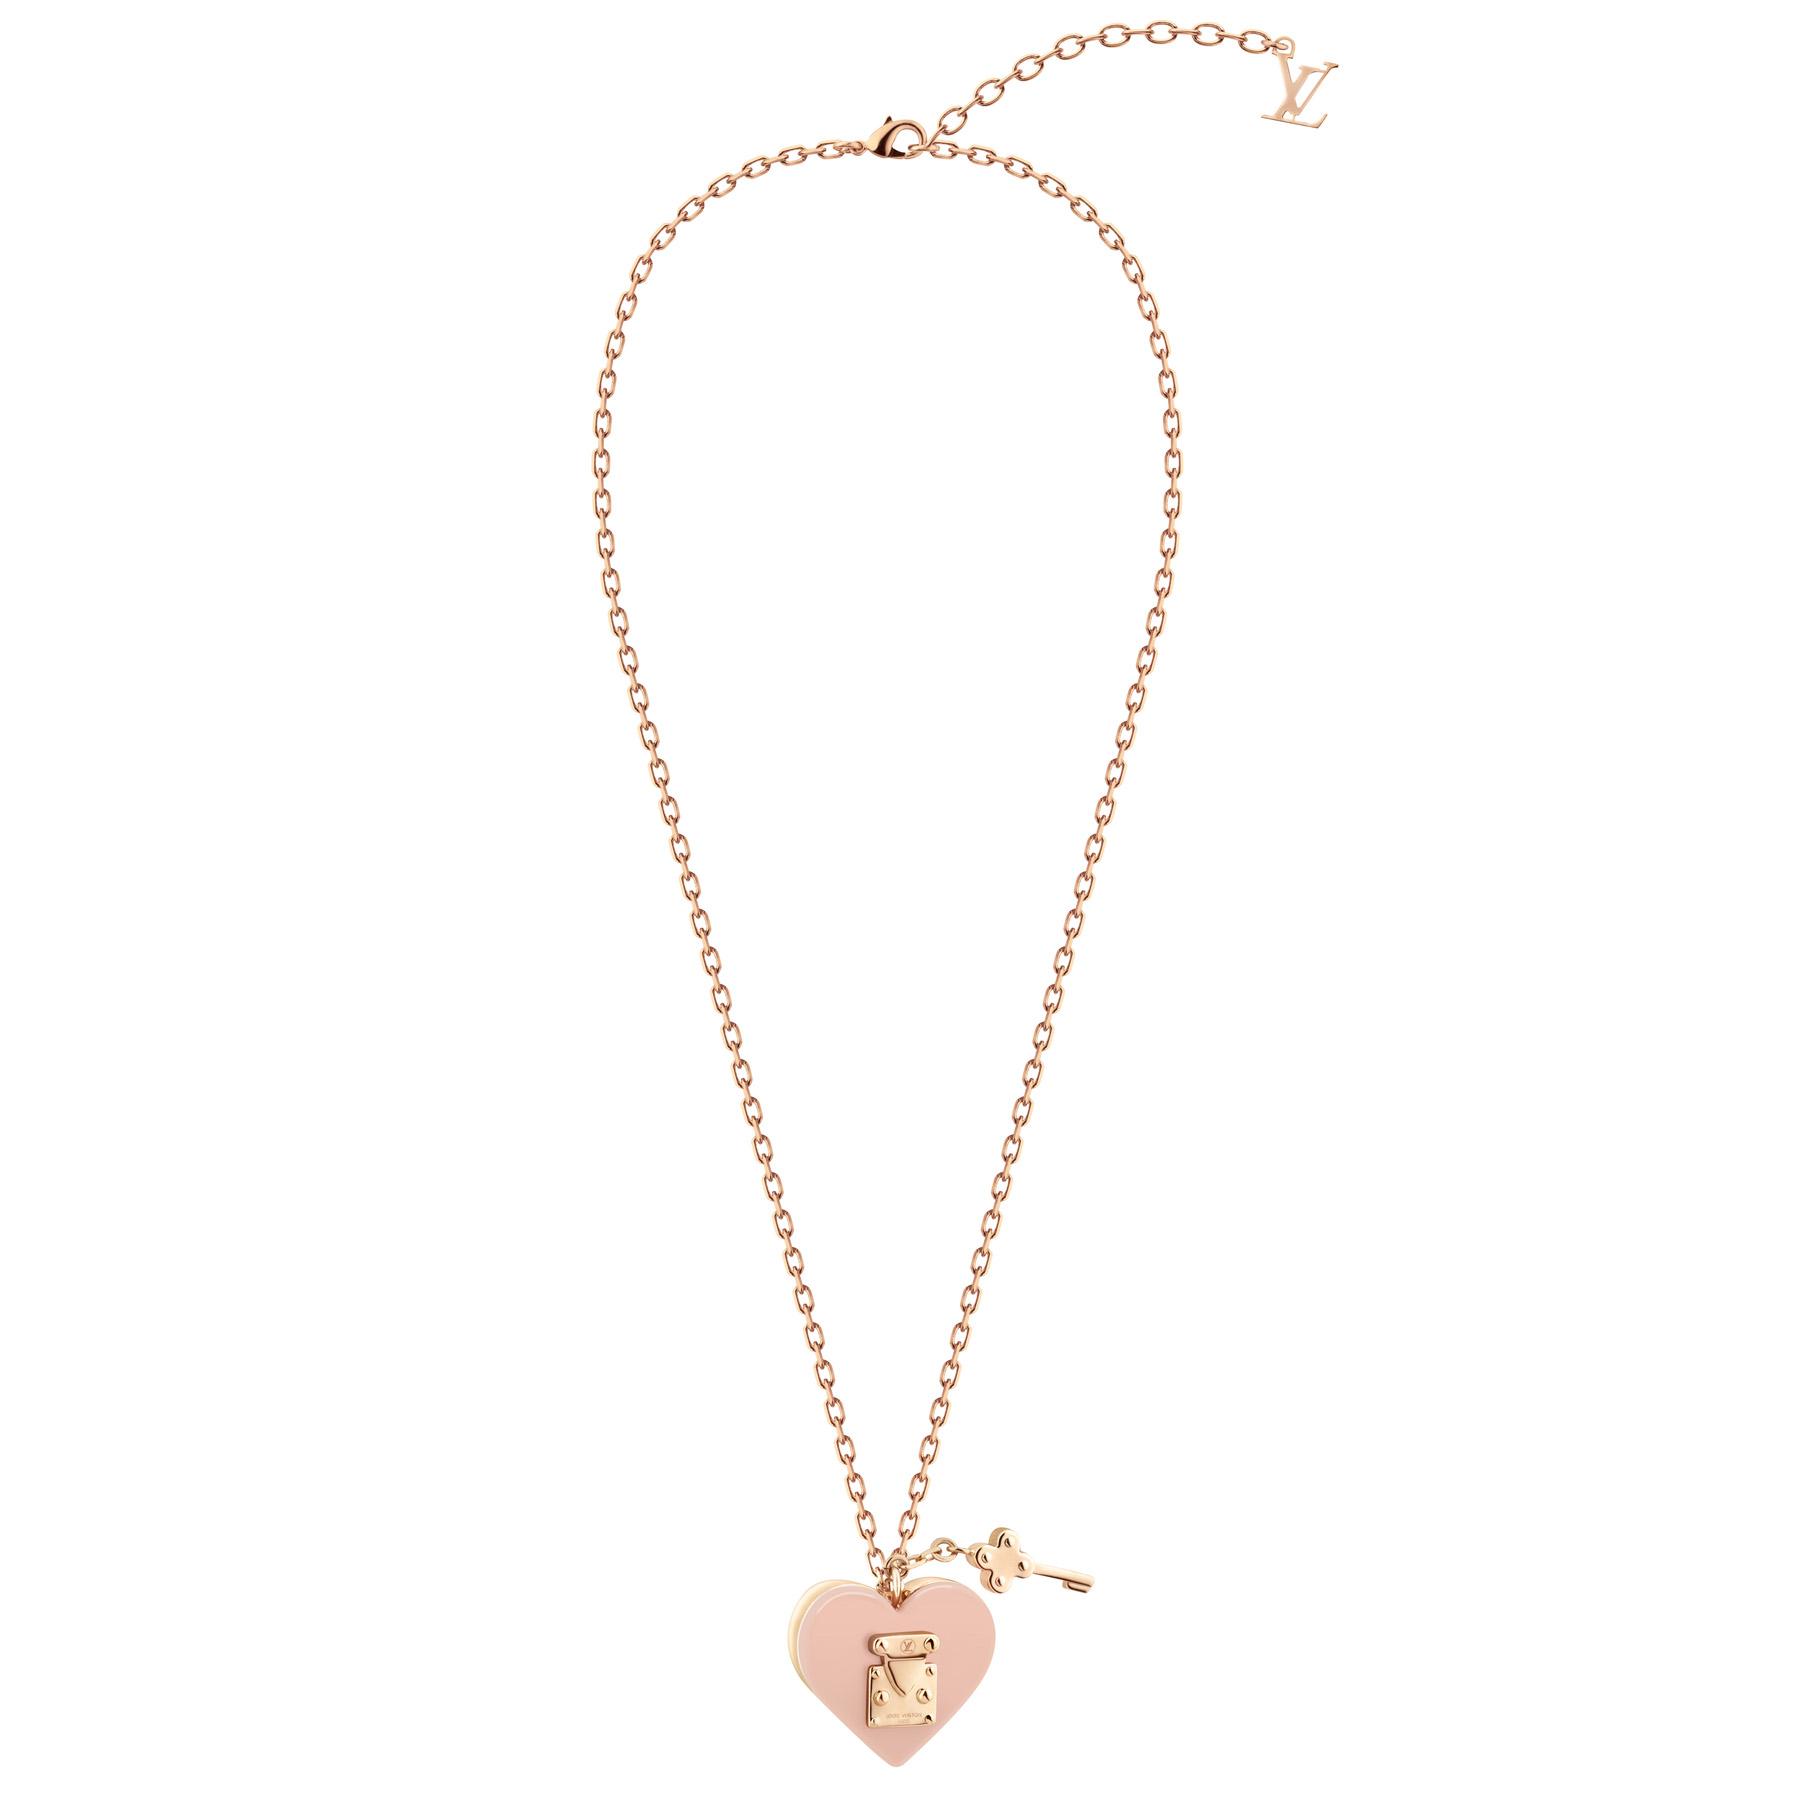 Louis Vuitton Lock Me 系列淡粉色桃心项链